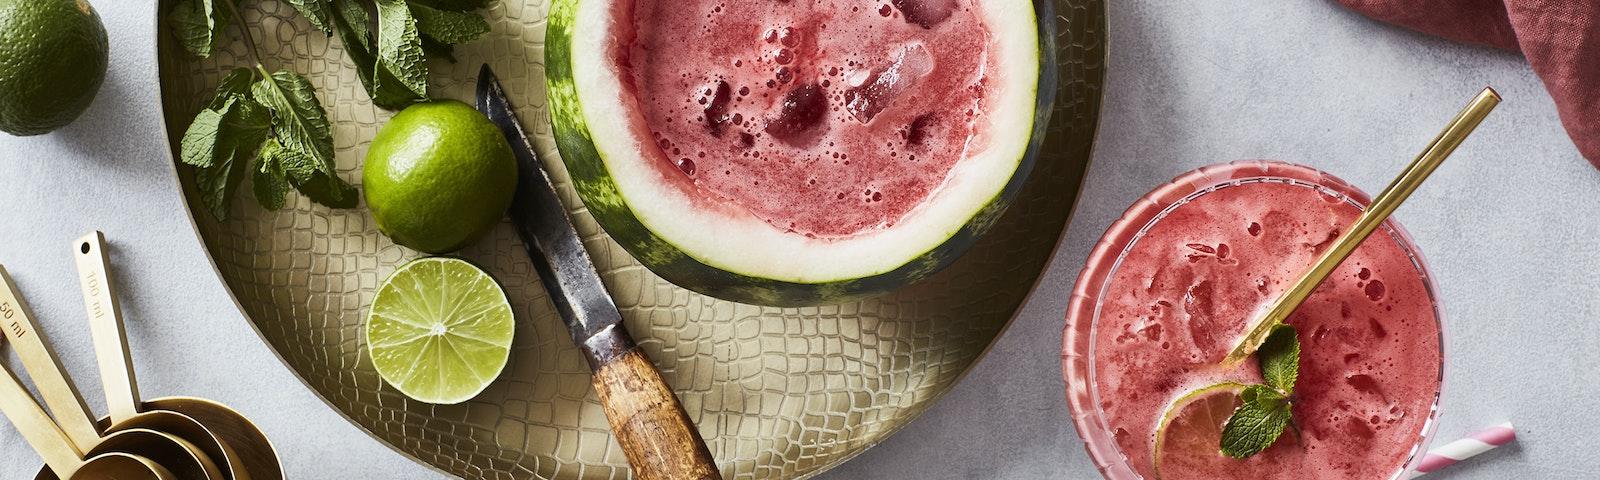 Vandmelon mojito